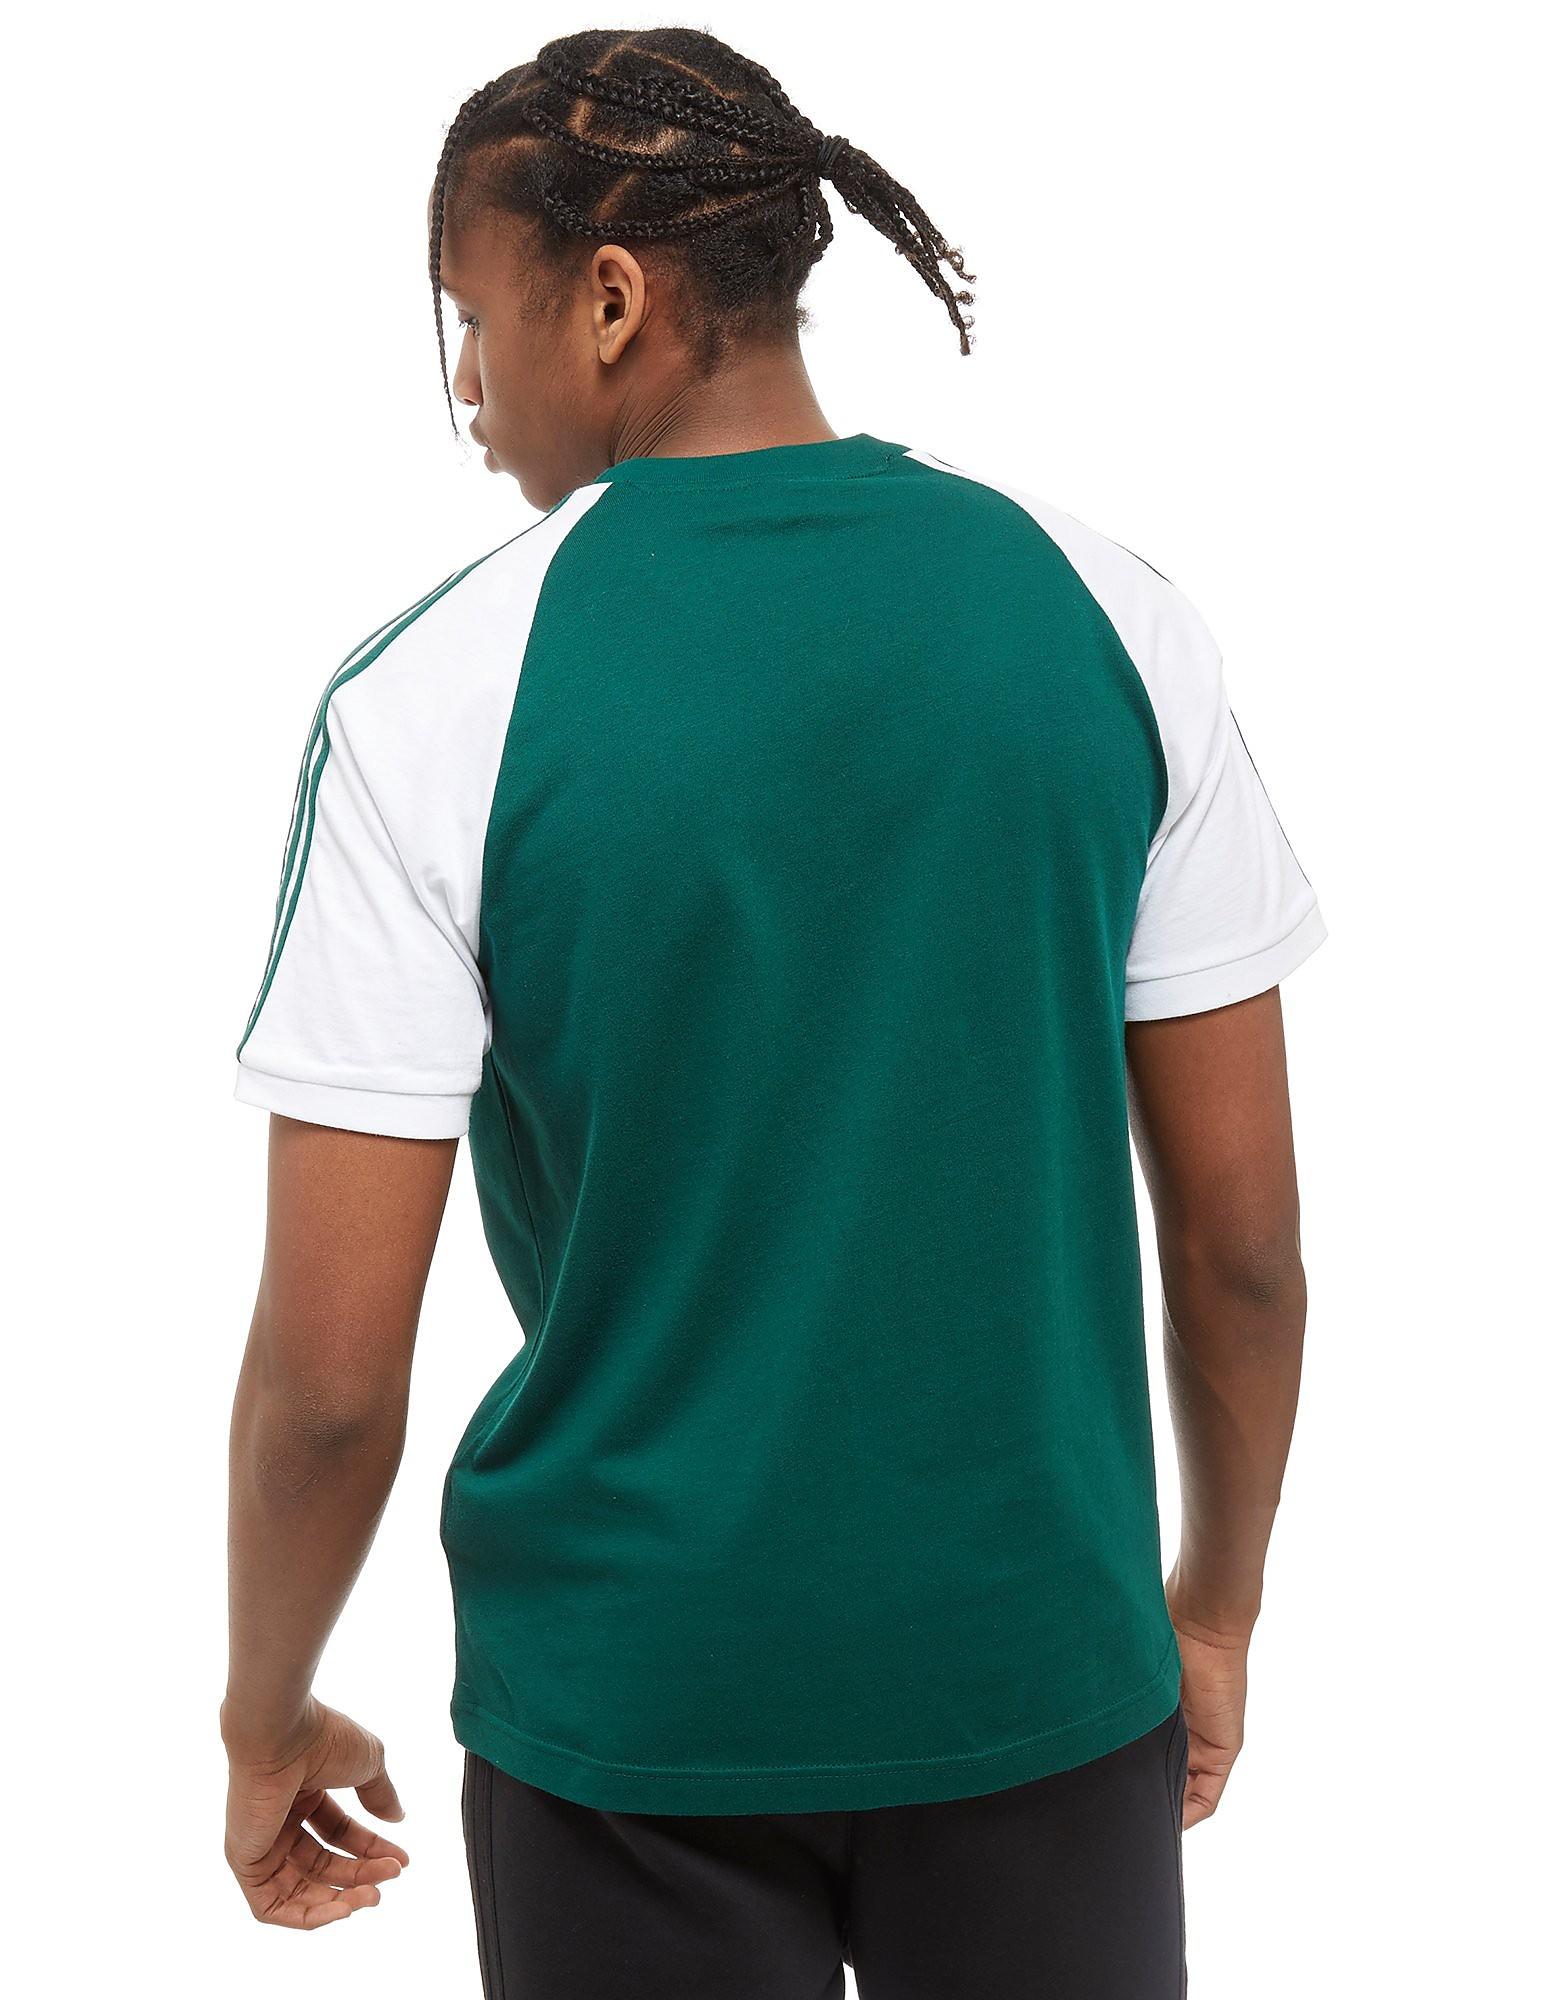 adidas Originals California Raglan Sleeve T-Shirt